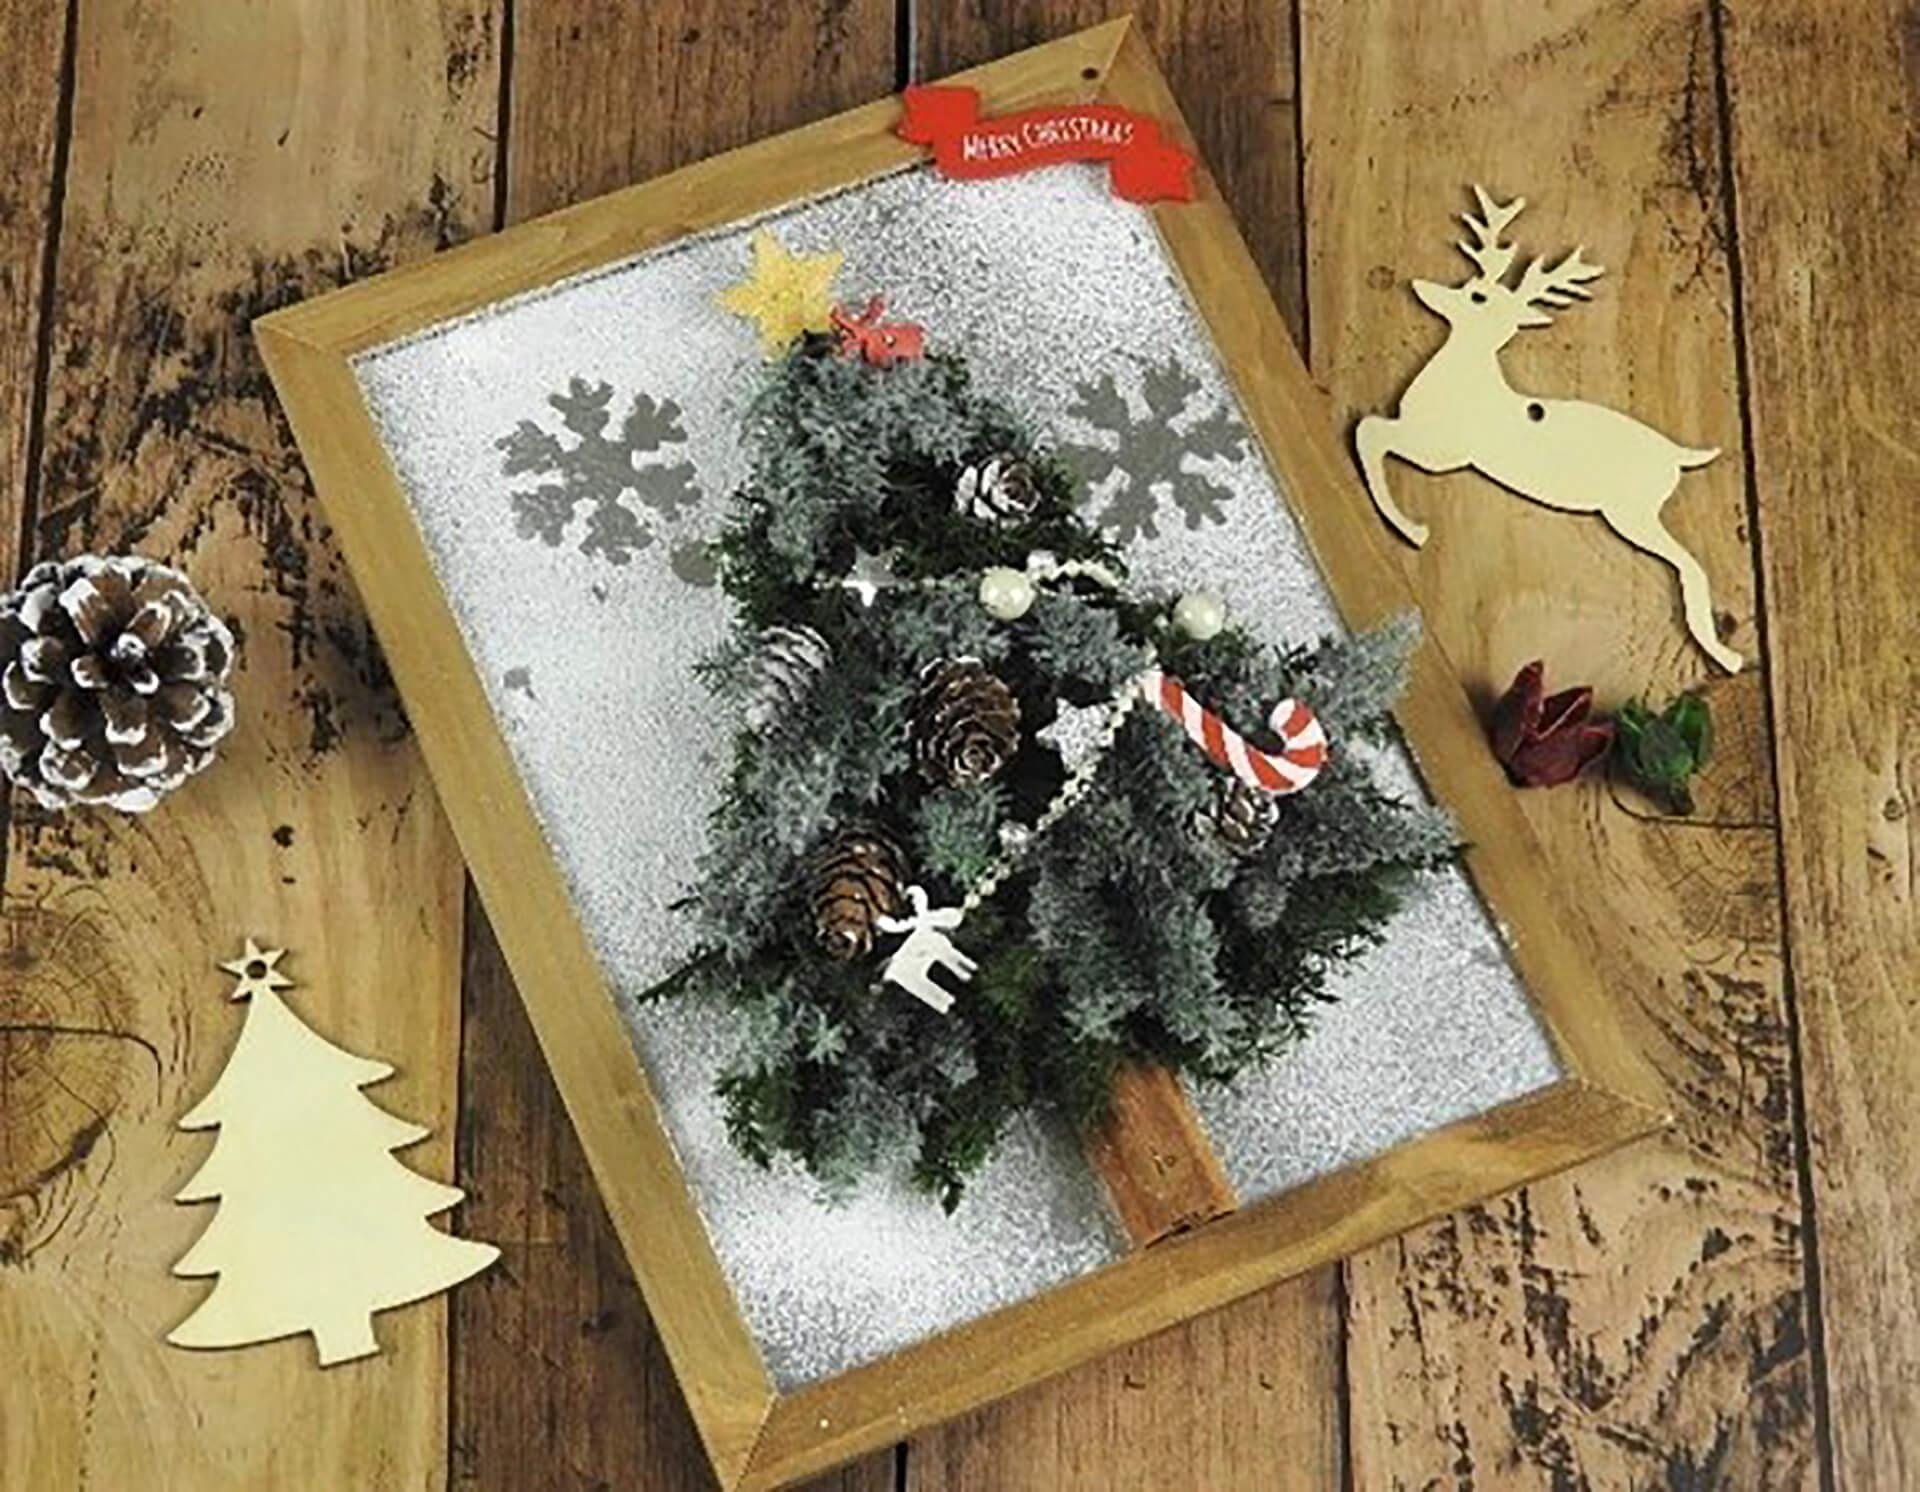 atelier La-luneのクリスマスツリー